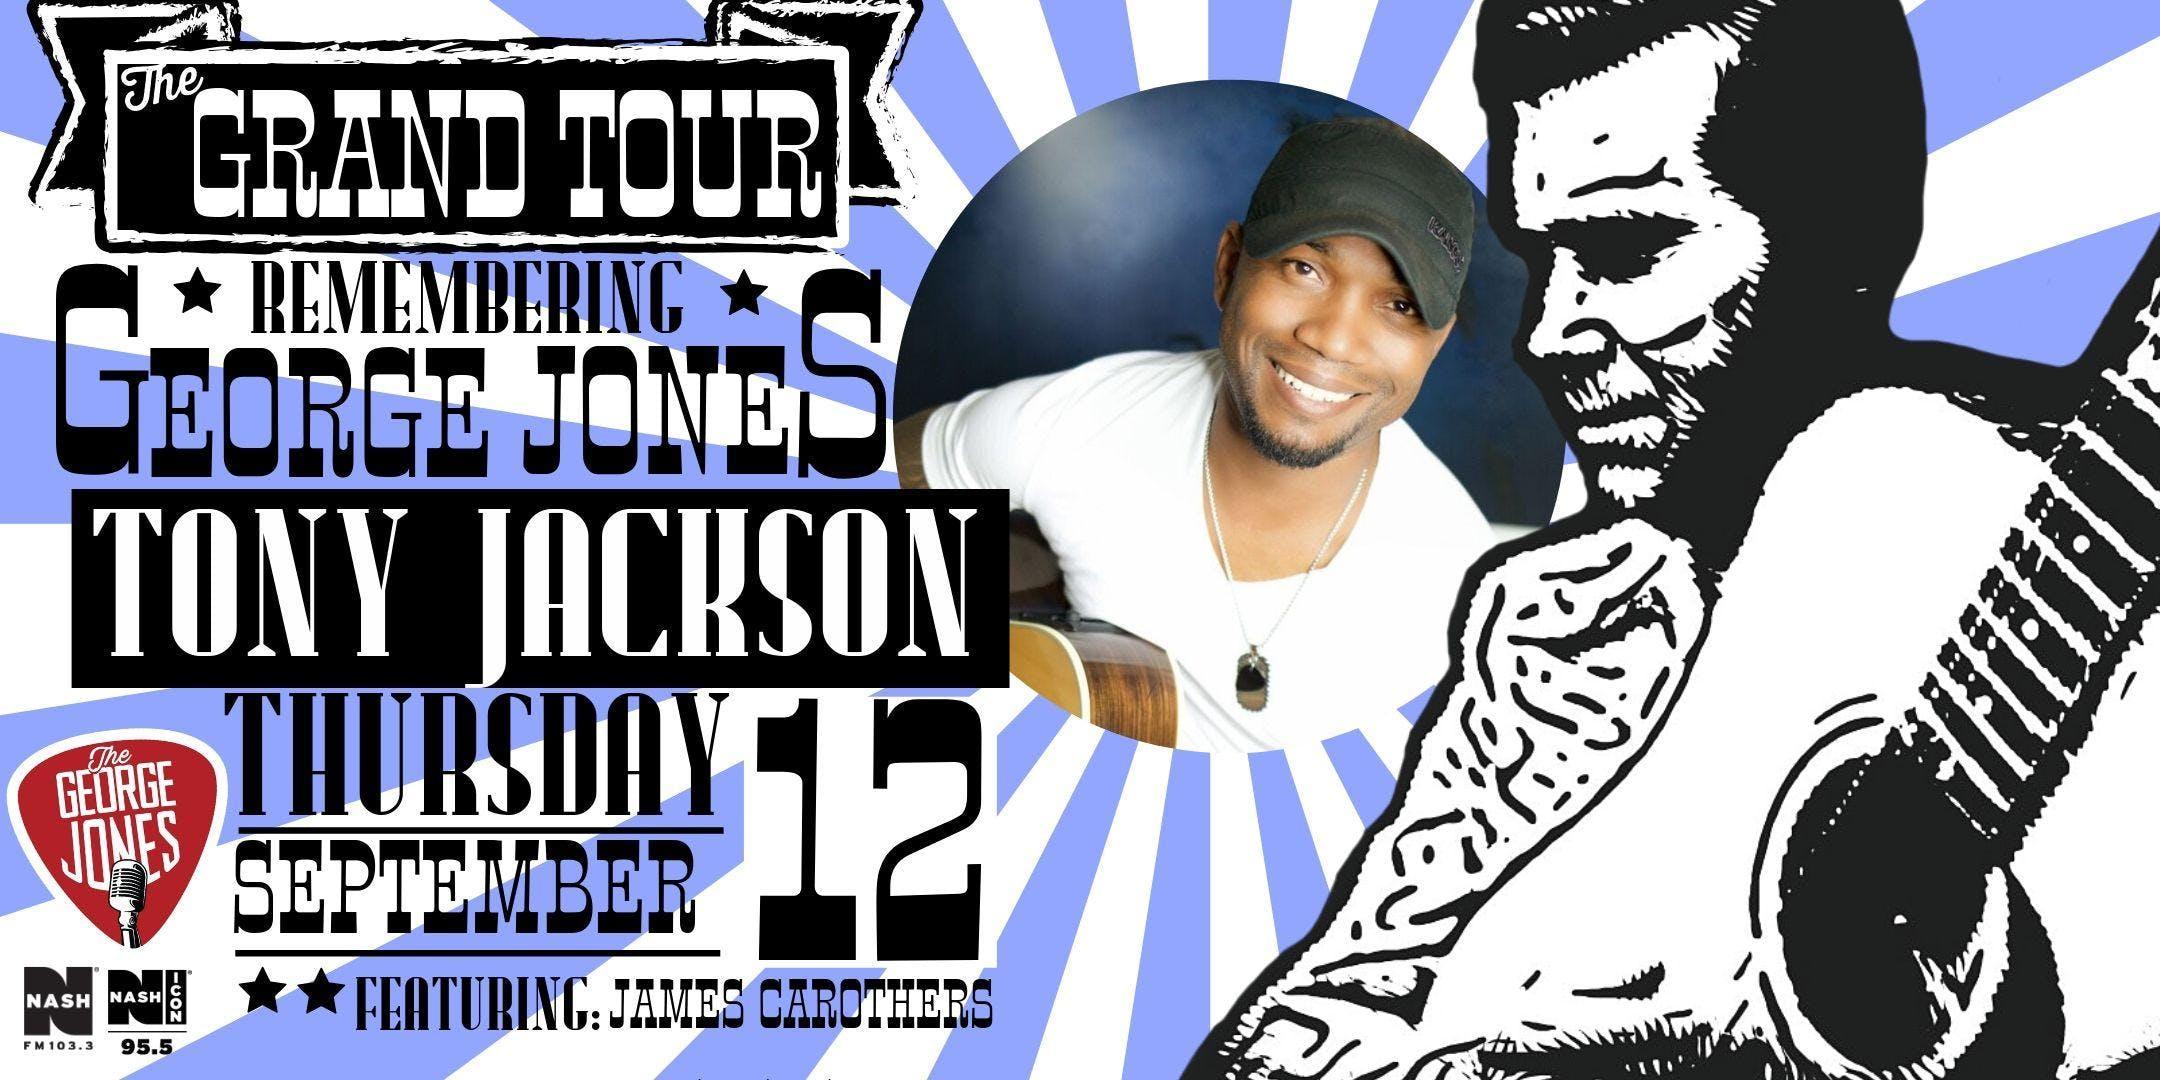 Remembering George Jones Tribute Concert Feat. Tony Jackson banner